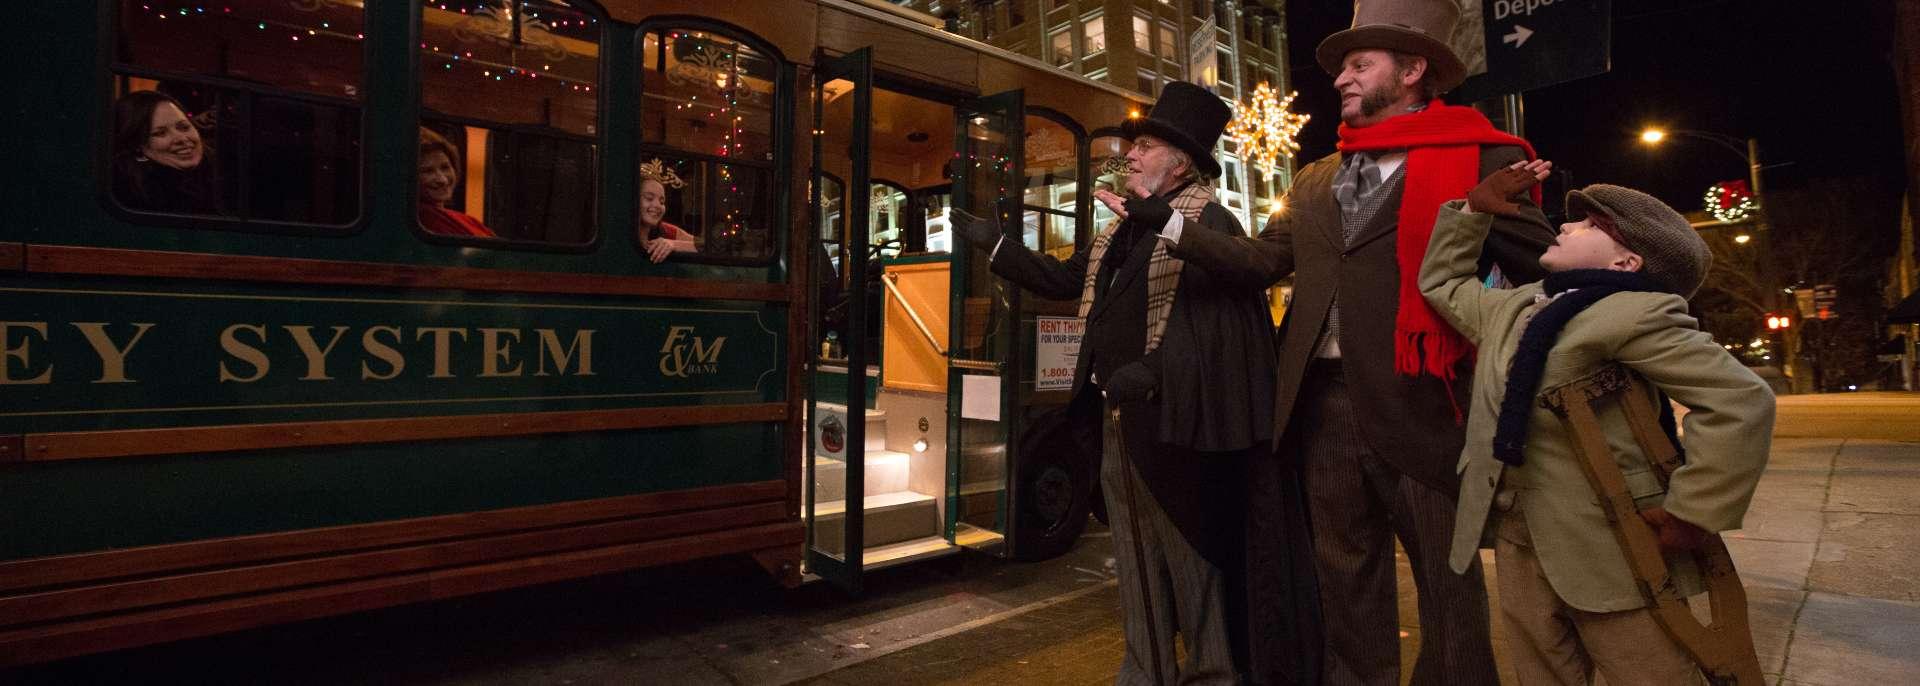 Scrooge Holiday Trolley Tour in Salisbury